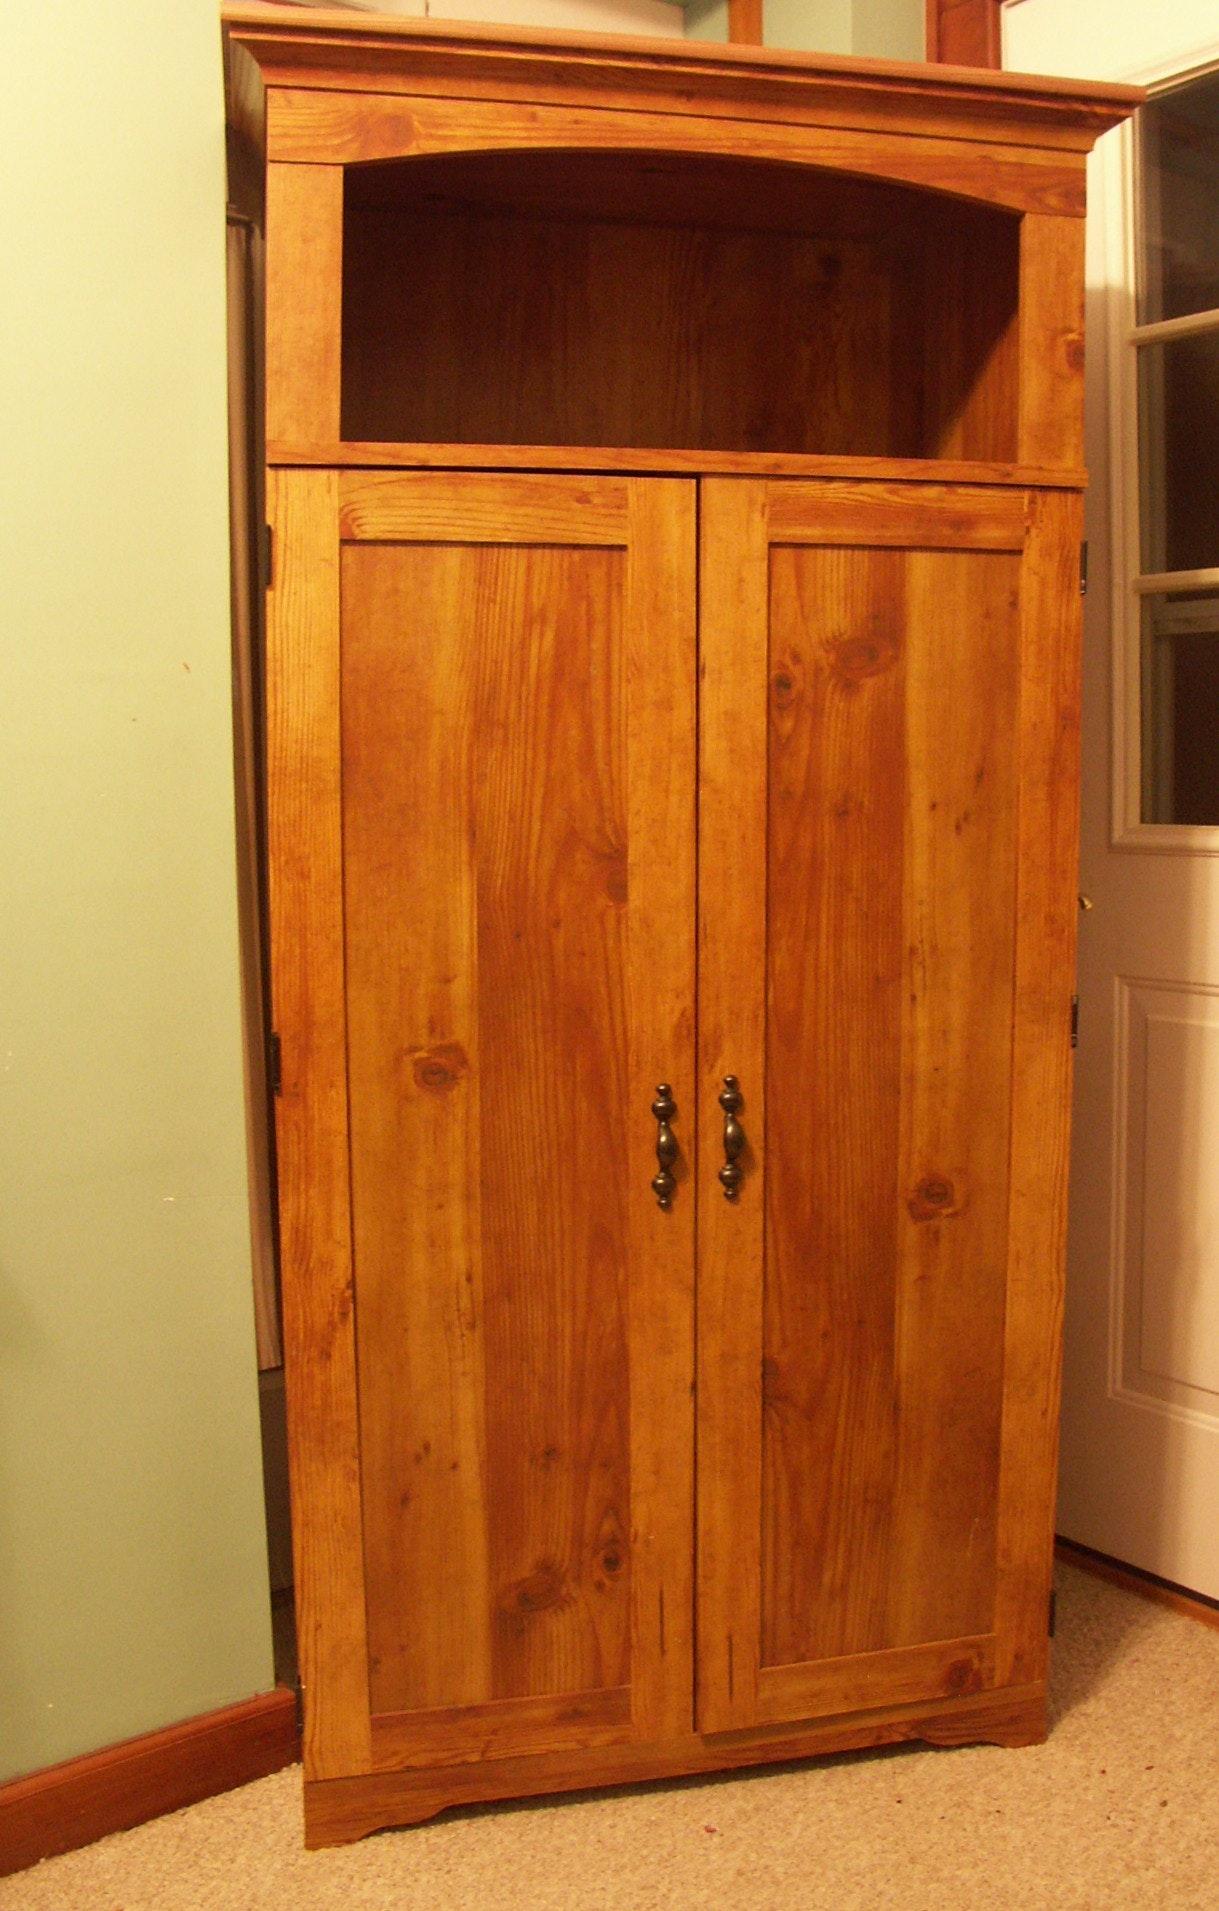 sauder pine finish computer armoire